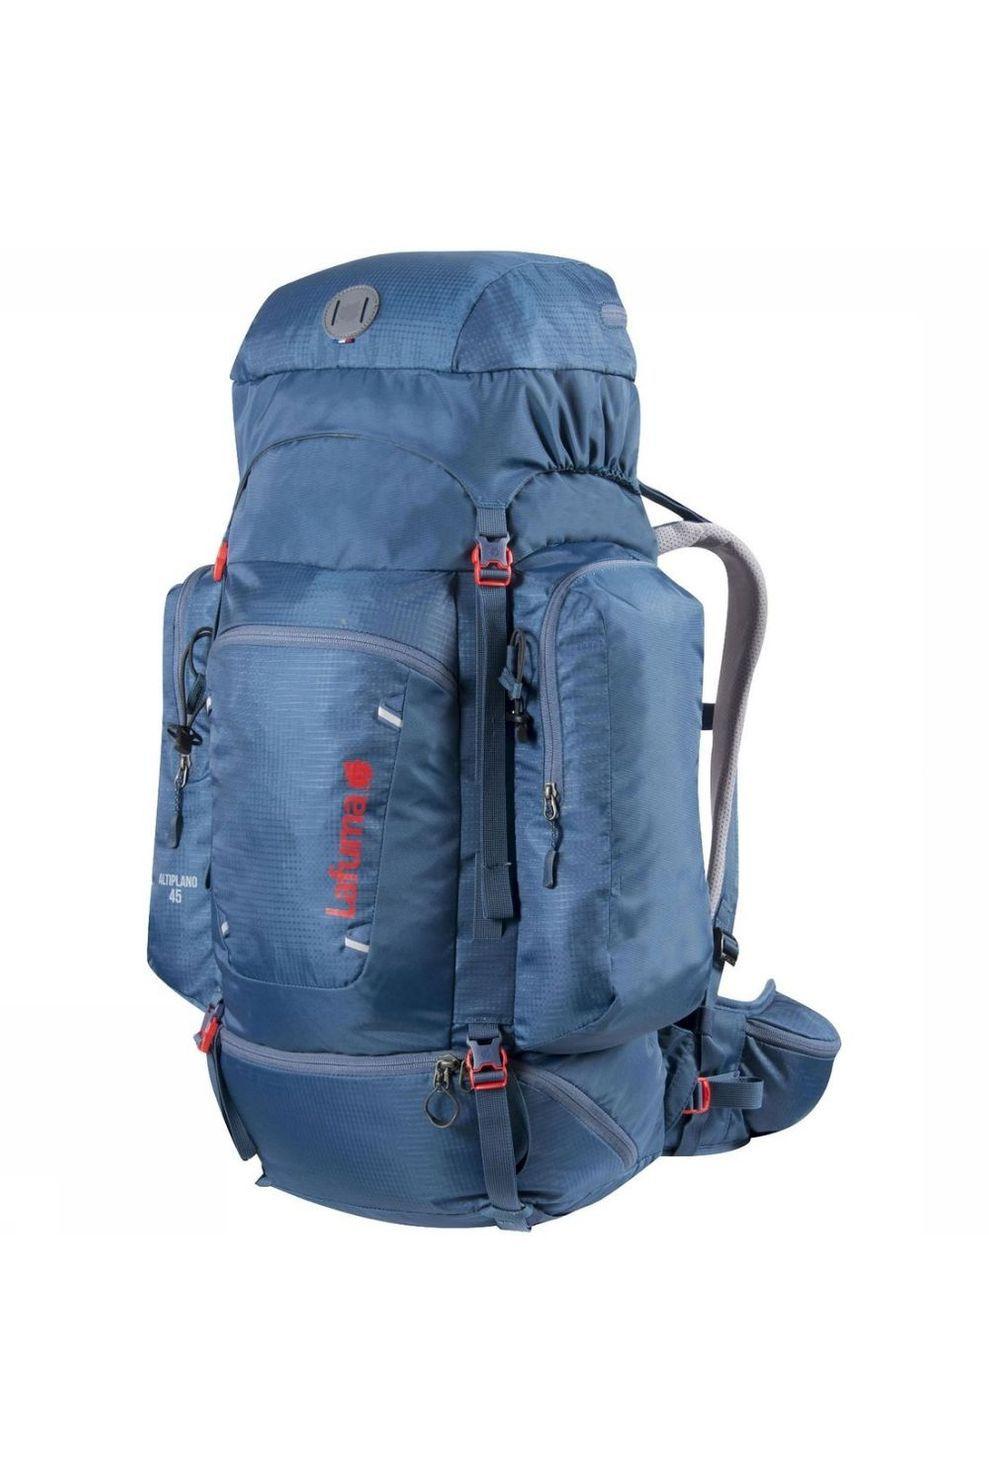 Lafuma Tourpack Altiplano 45 - Blauw/Rood